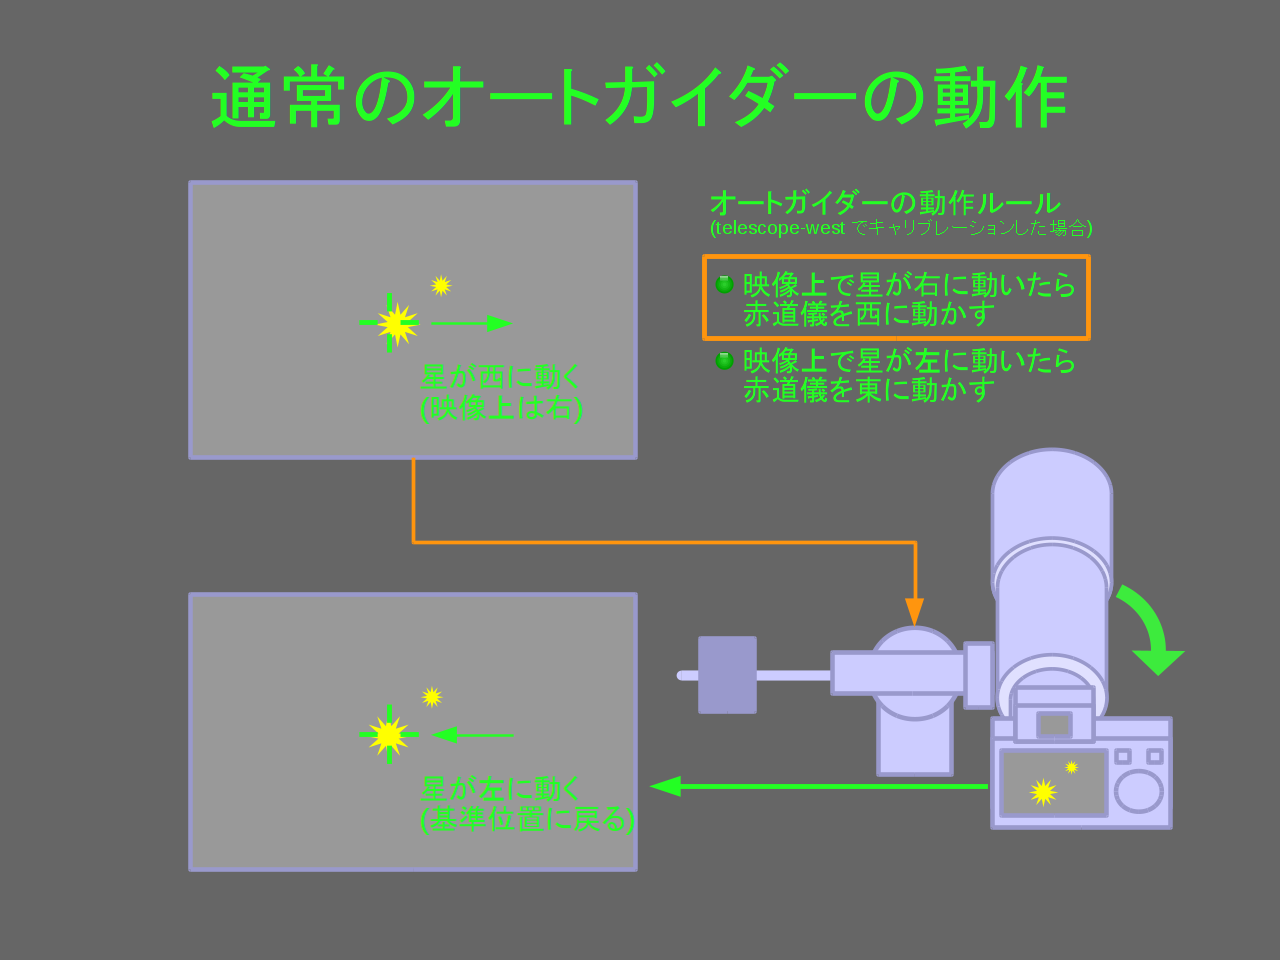 http://rna.sakura.ne.jp/share/telescope-flip-04.png